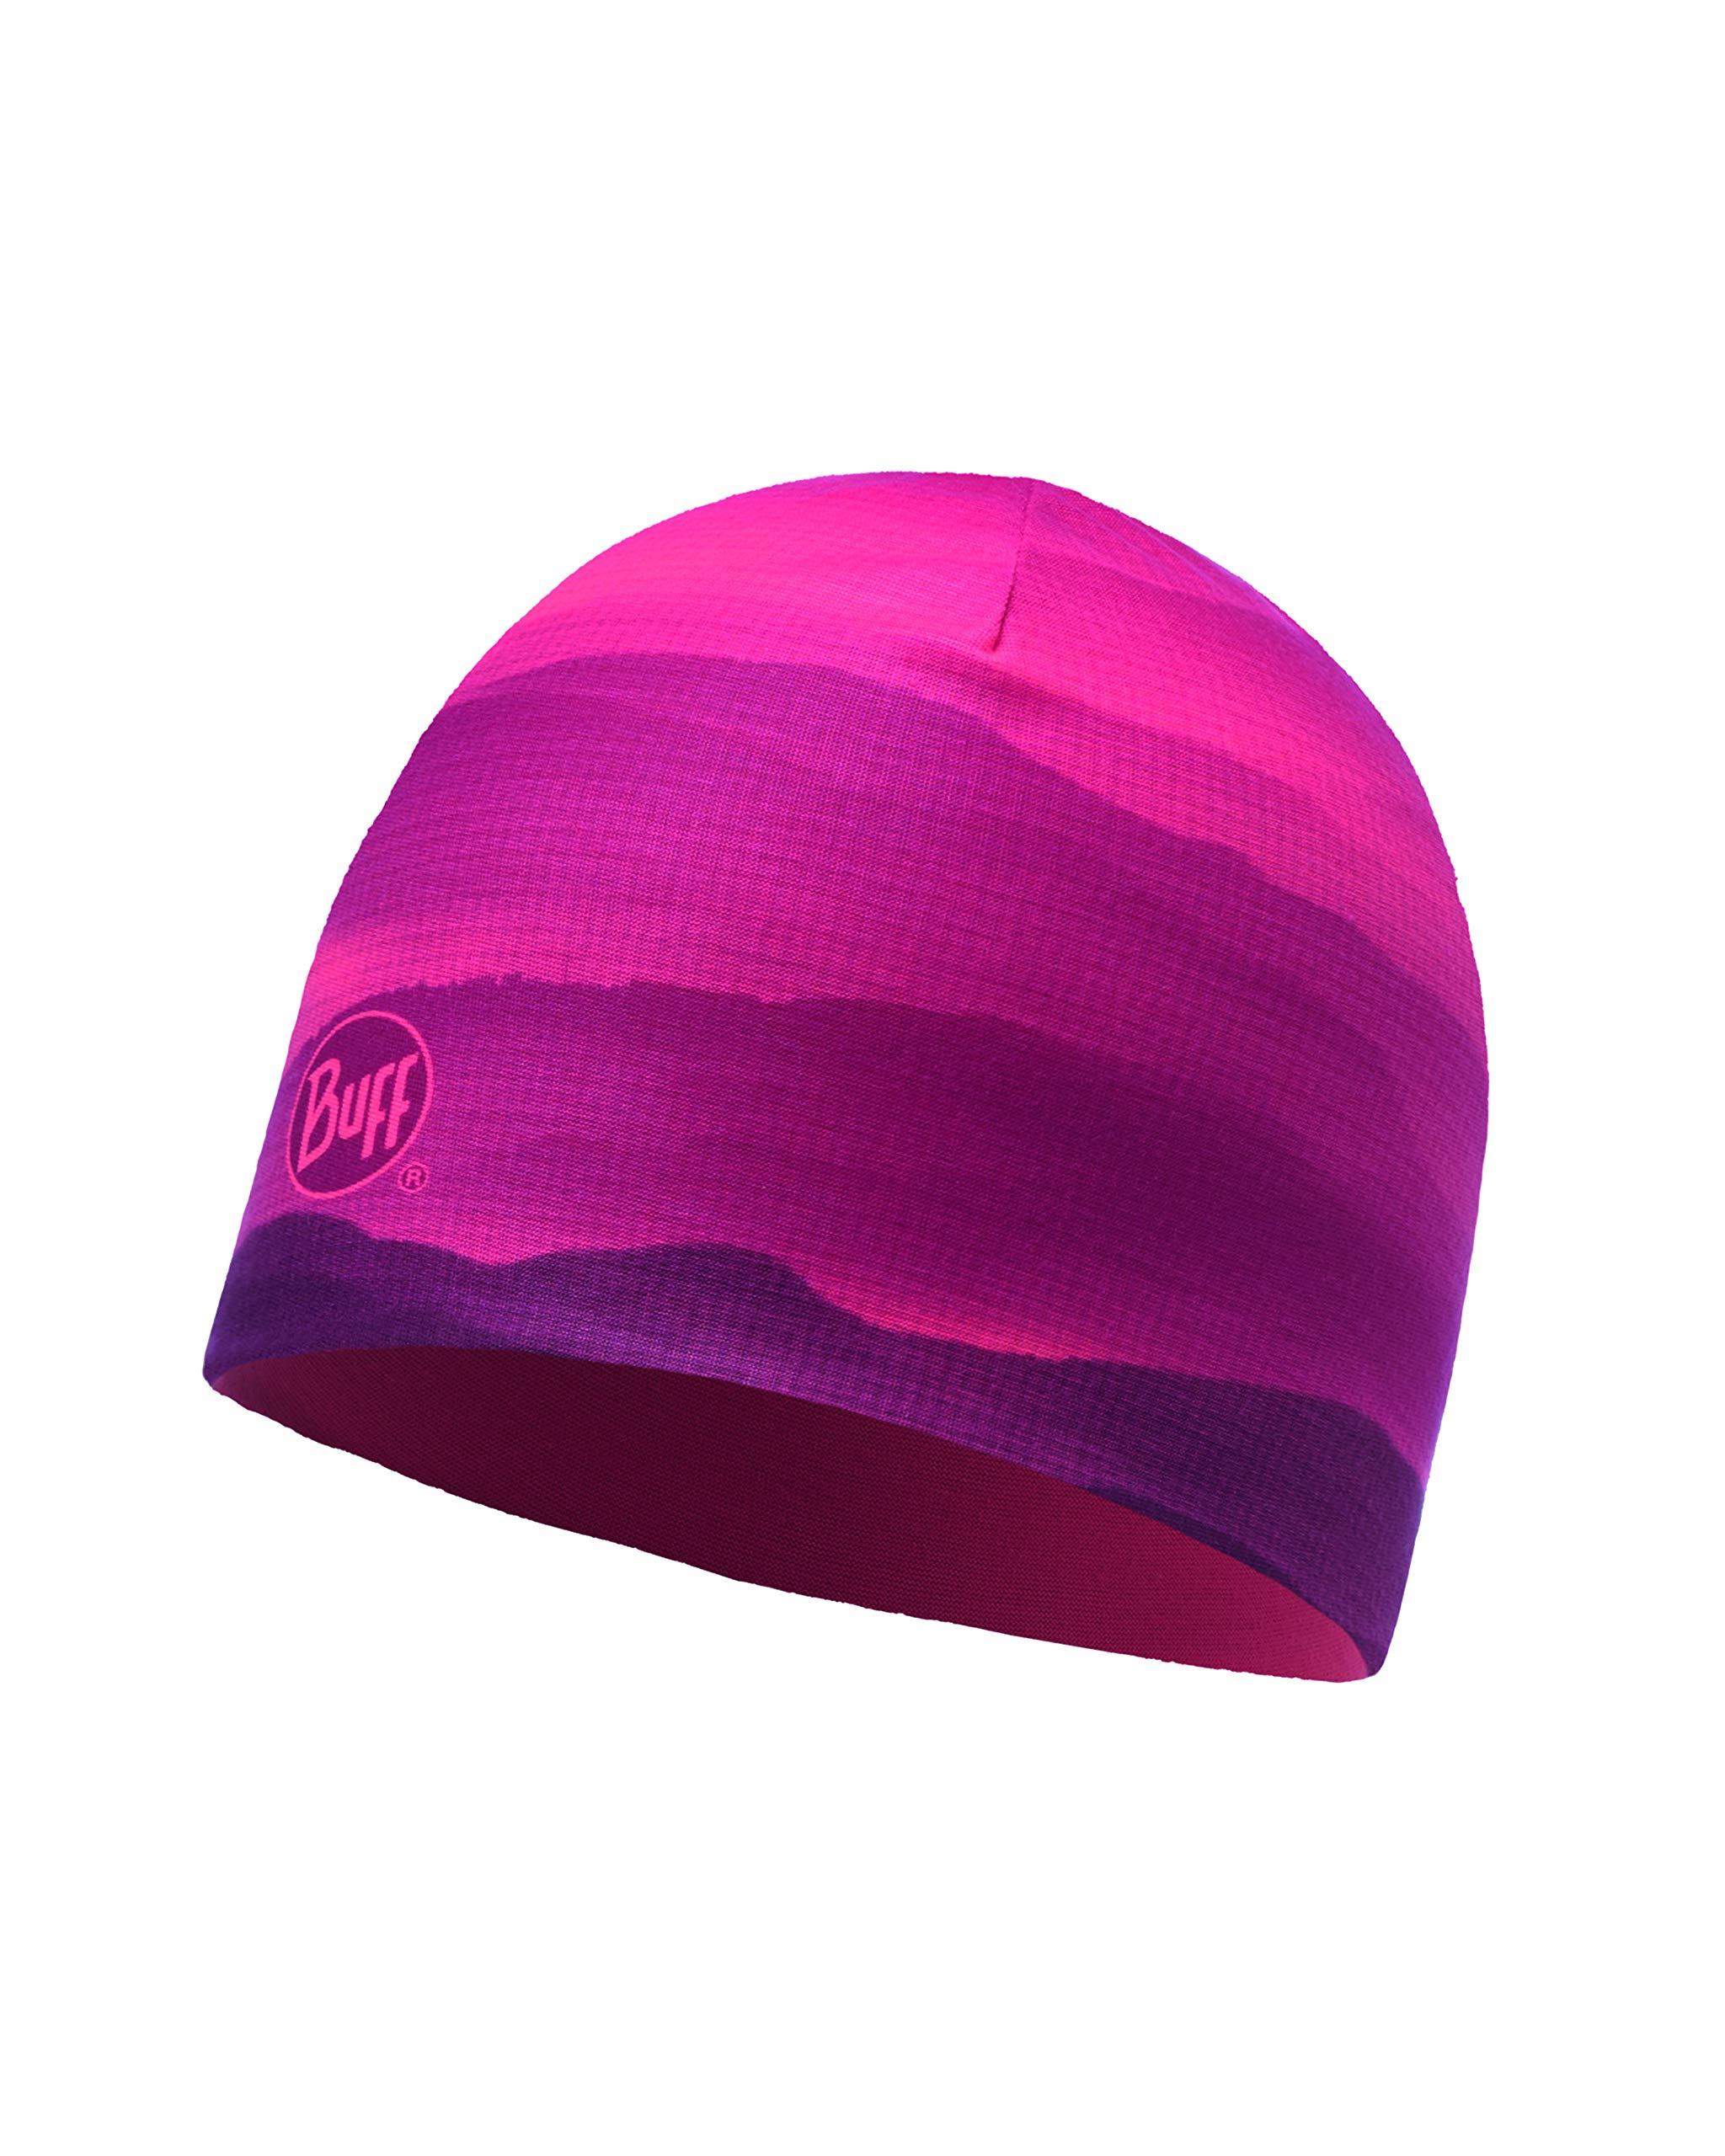 Buff Women's Soft Hills Microfiber Reversible Hat, Pink Fluor, Adult